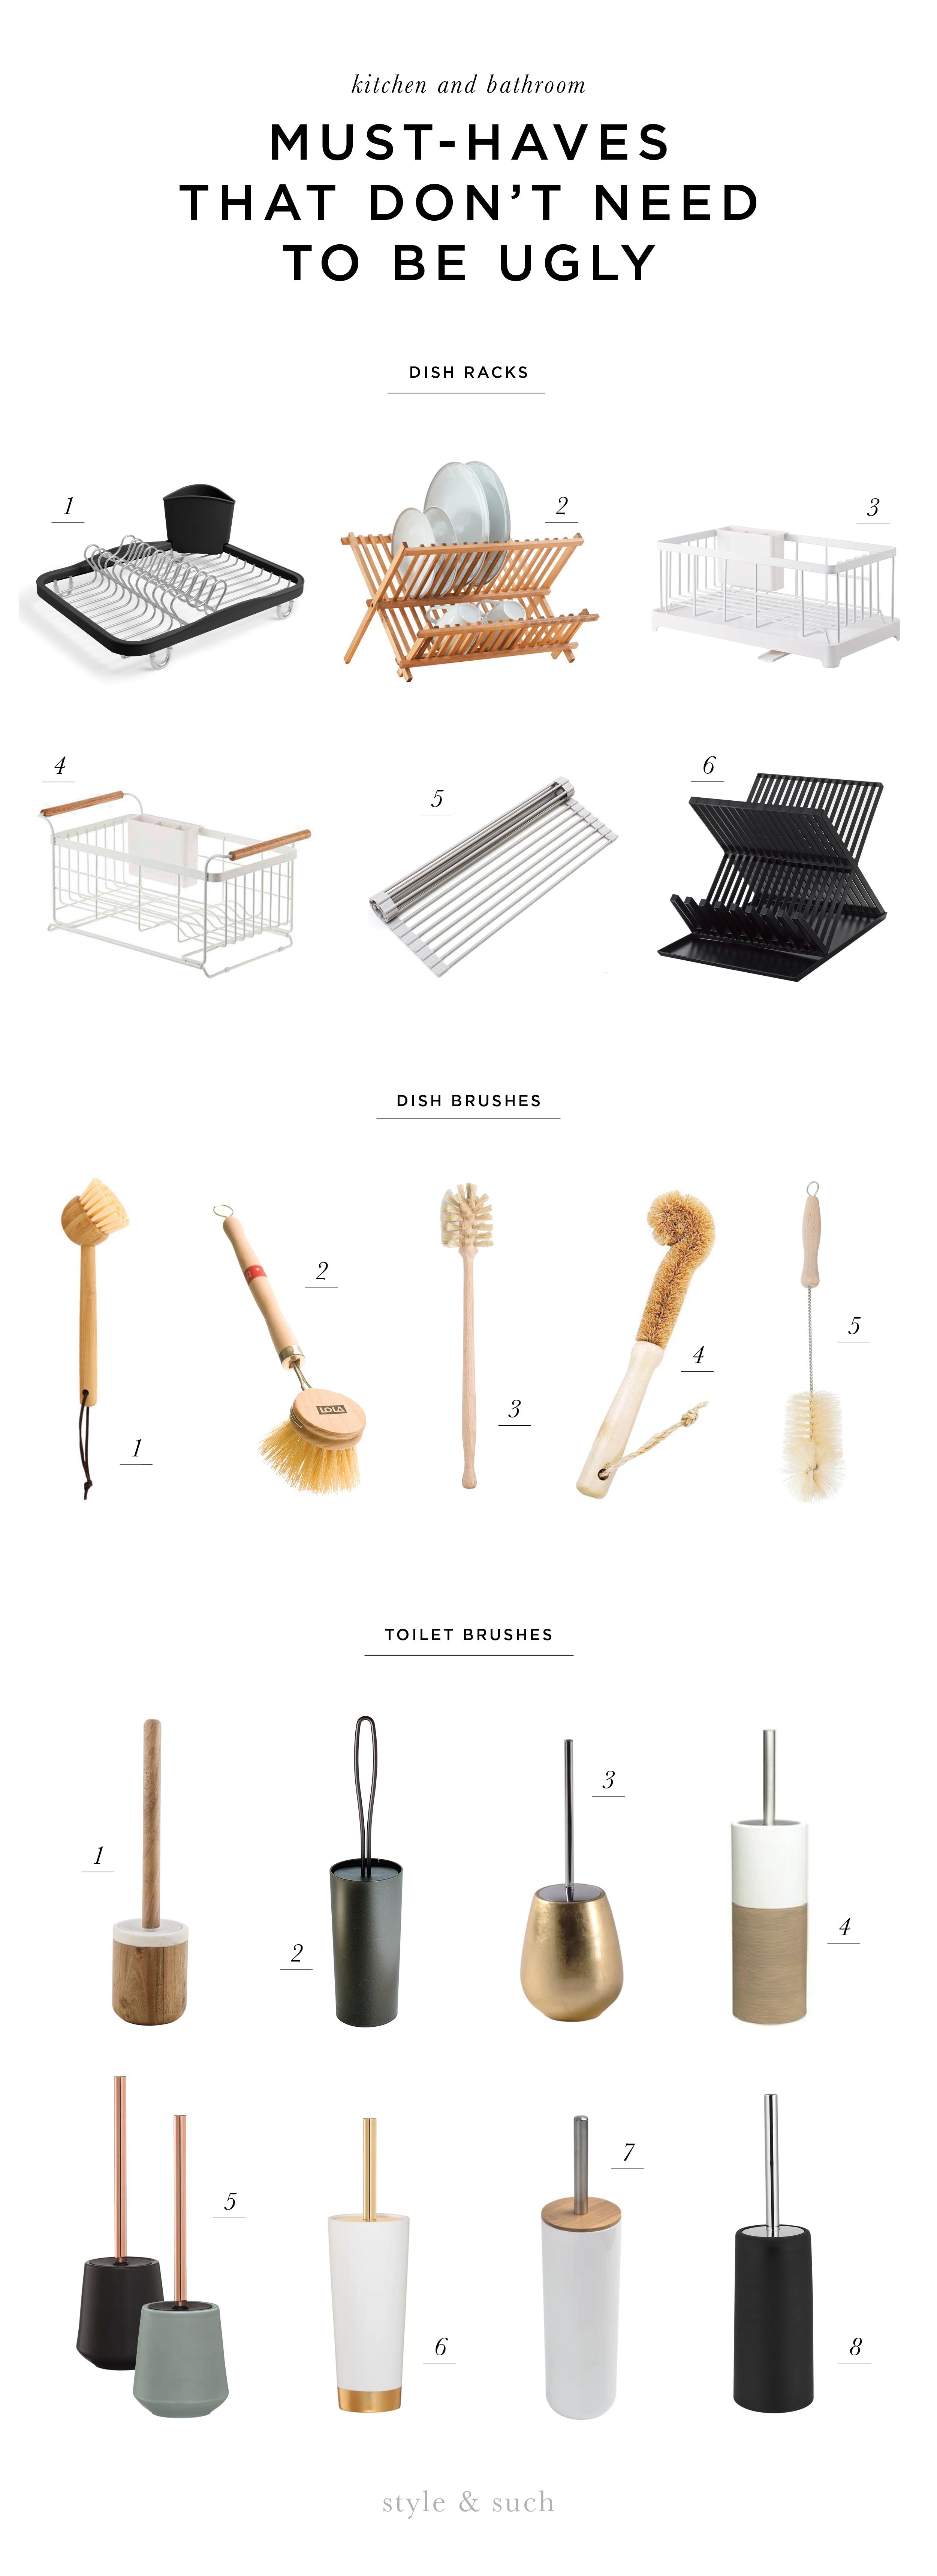 DISH RACKS 1.  Sinkin Dish Rack  2.  Wooden Basic Dish Rack  | 3.  Tower Wire Dish Rack  | 4.  Tosca Over the Sink Rack  | 5.  Over the Sink Multipurpose Dish Rack  | 6.  Tower Dish Rack (in black and white)   DISH BRUSHES 1.  Bamboo Dish Brush  | 2.  Tampico Wooden Brush  | 3.  Soft Horse Hair Bottle Brush  | 4.  Natural Wood Bristle Brush  | 5.  Bristle Soda Brush   TOILET BRUSHES 1.  Prajat Toilet Brush  | 2.  Loop Toilet Brush  | 3.  Almira Toilet Brush  | 4.  Doppio Toilet Brush  | 5.  Conical Toilet Brush  | 6.  Glossy Toilet Brush  | 7.  Padang Toilet Brush  | 8.  Stainless Toilet Brush